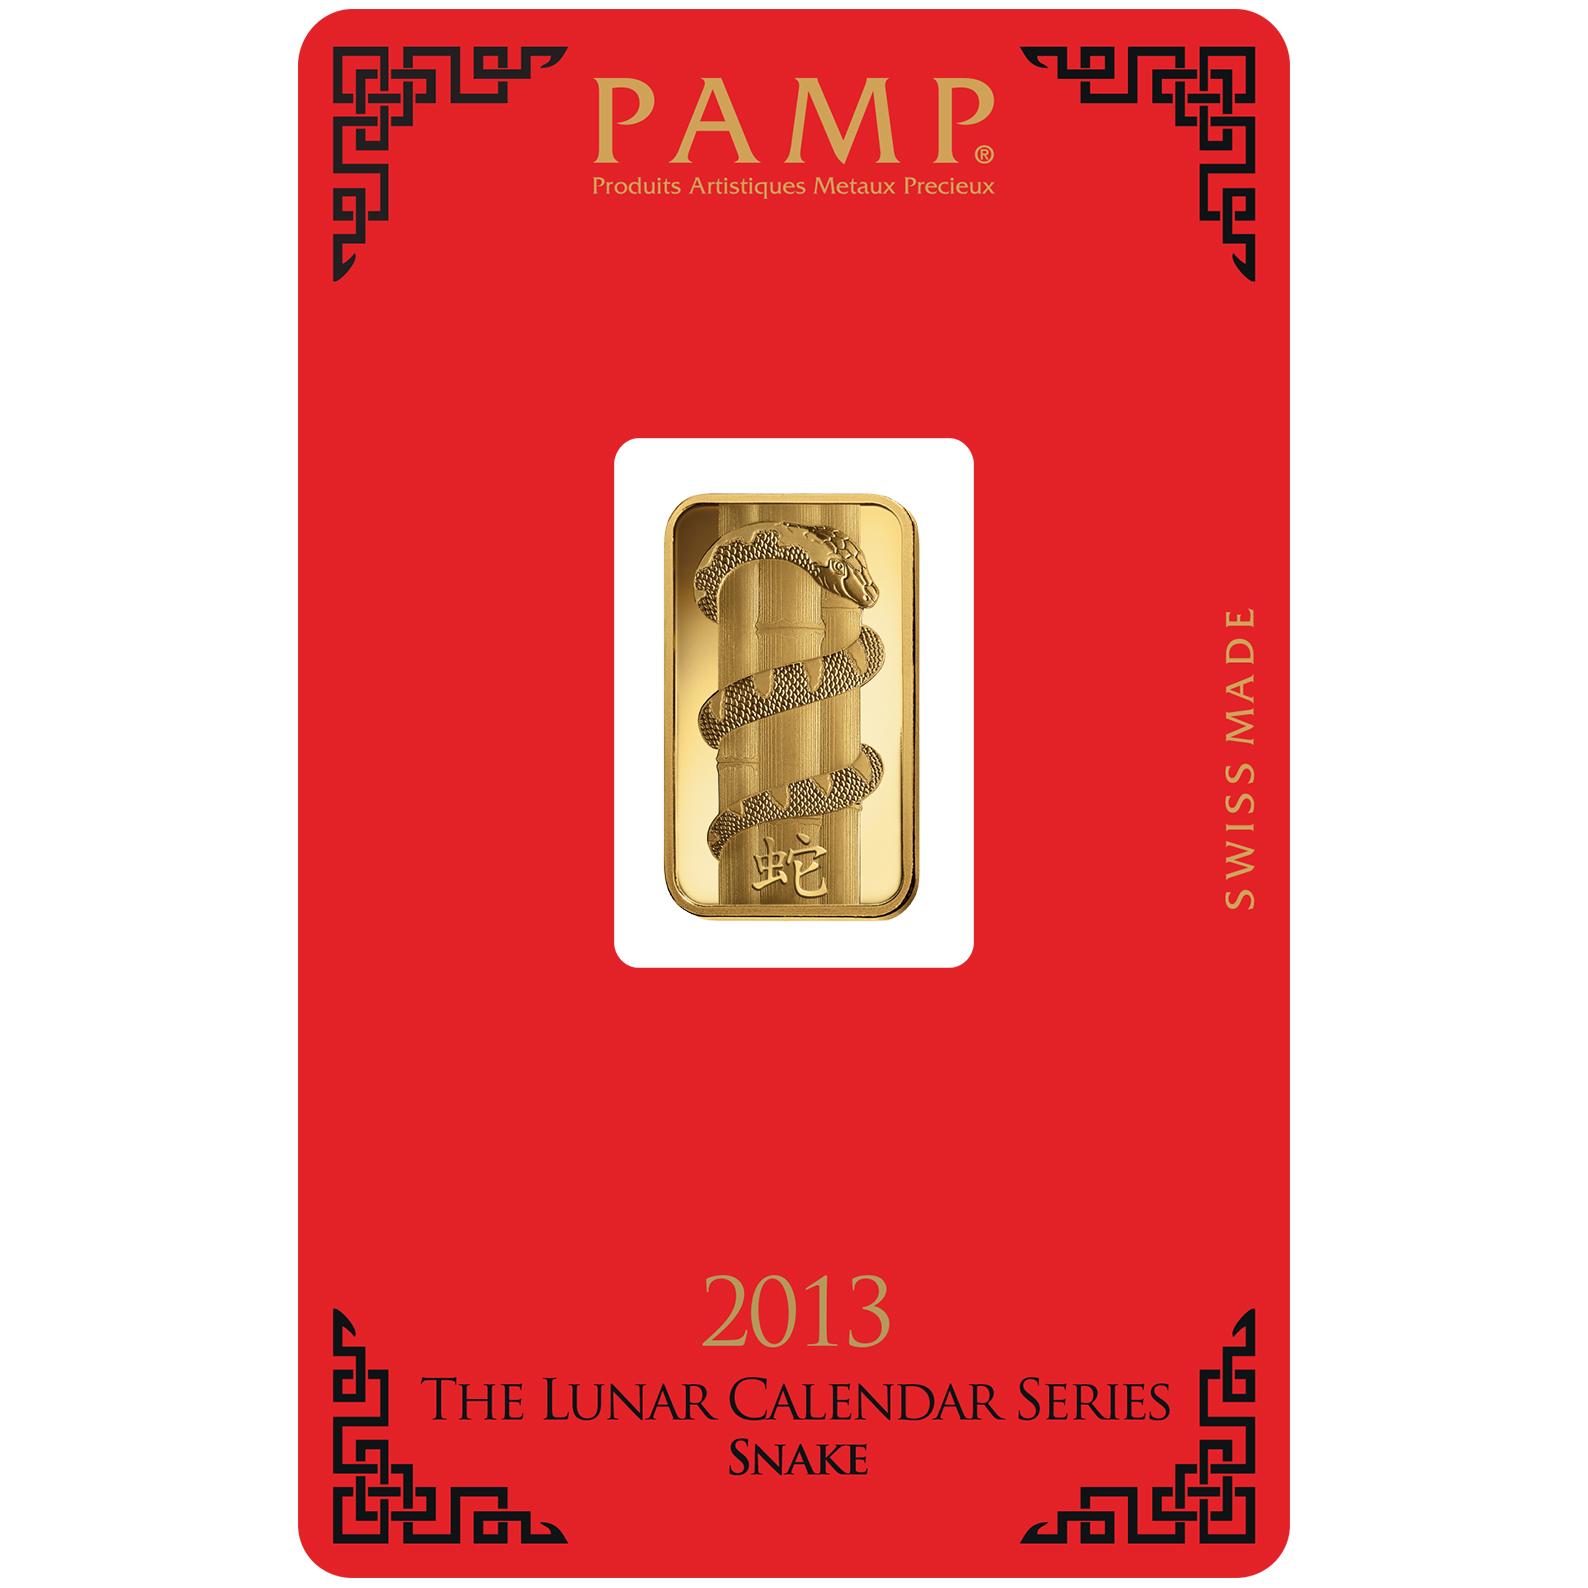 Lingotin d'or de 5 grammes - PAMP Suisse Lunar Serpent